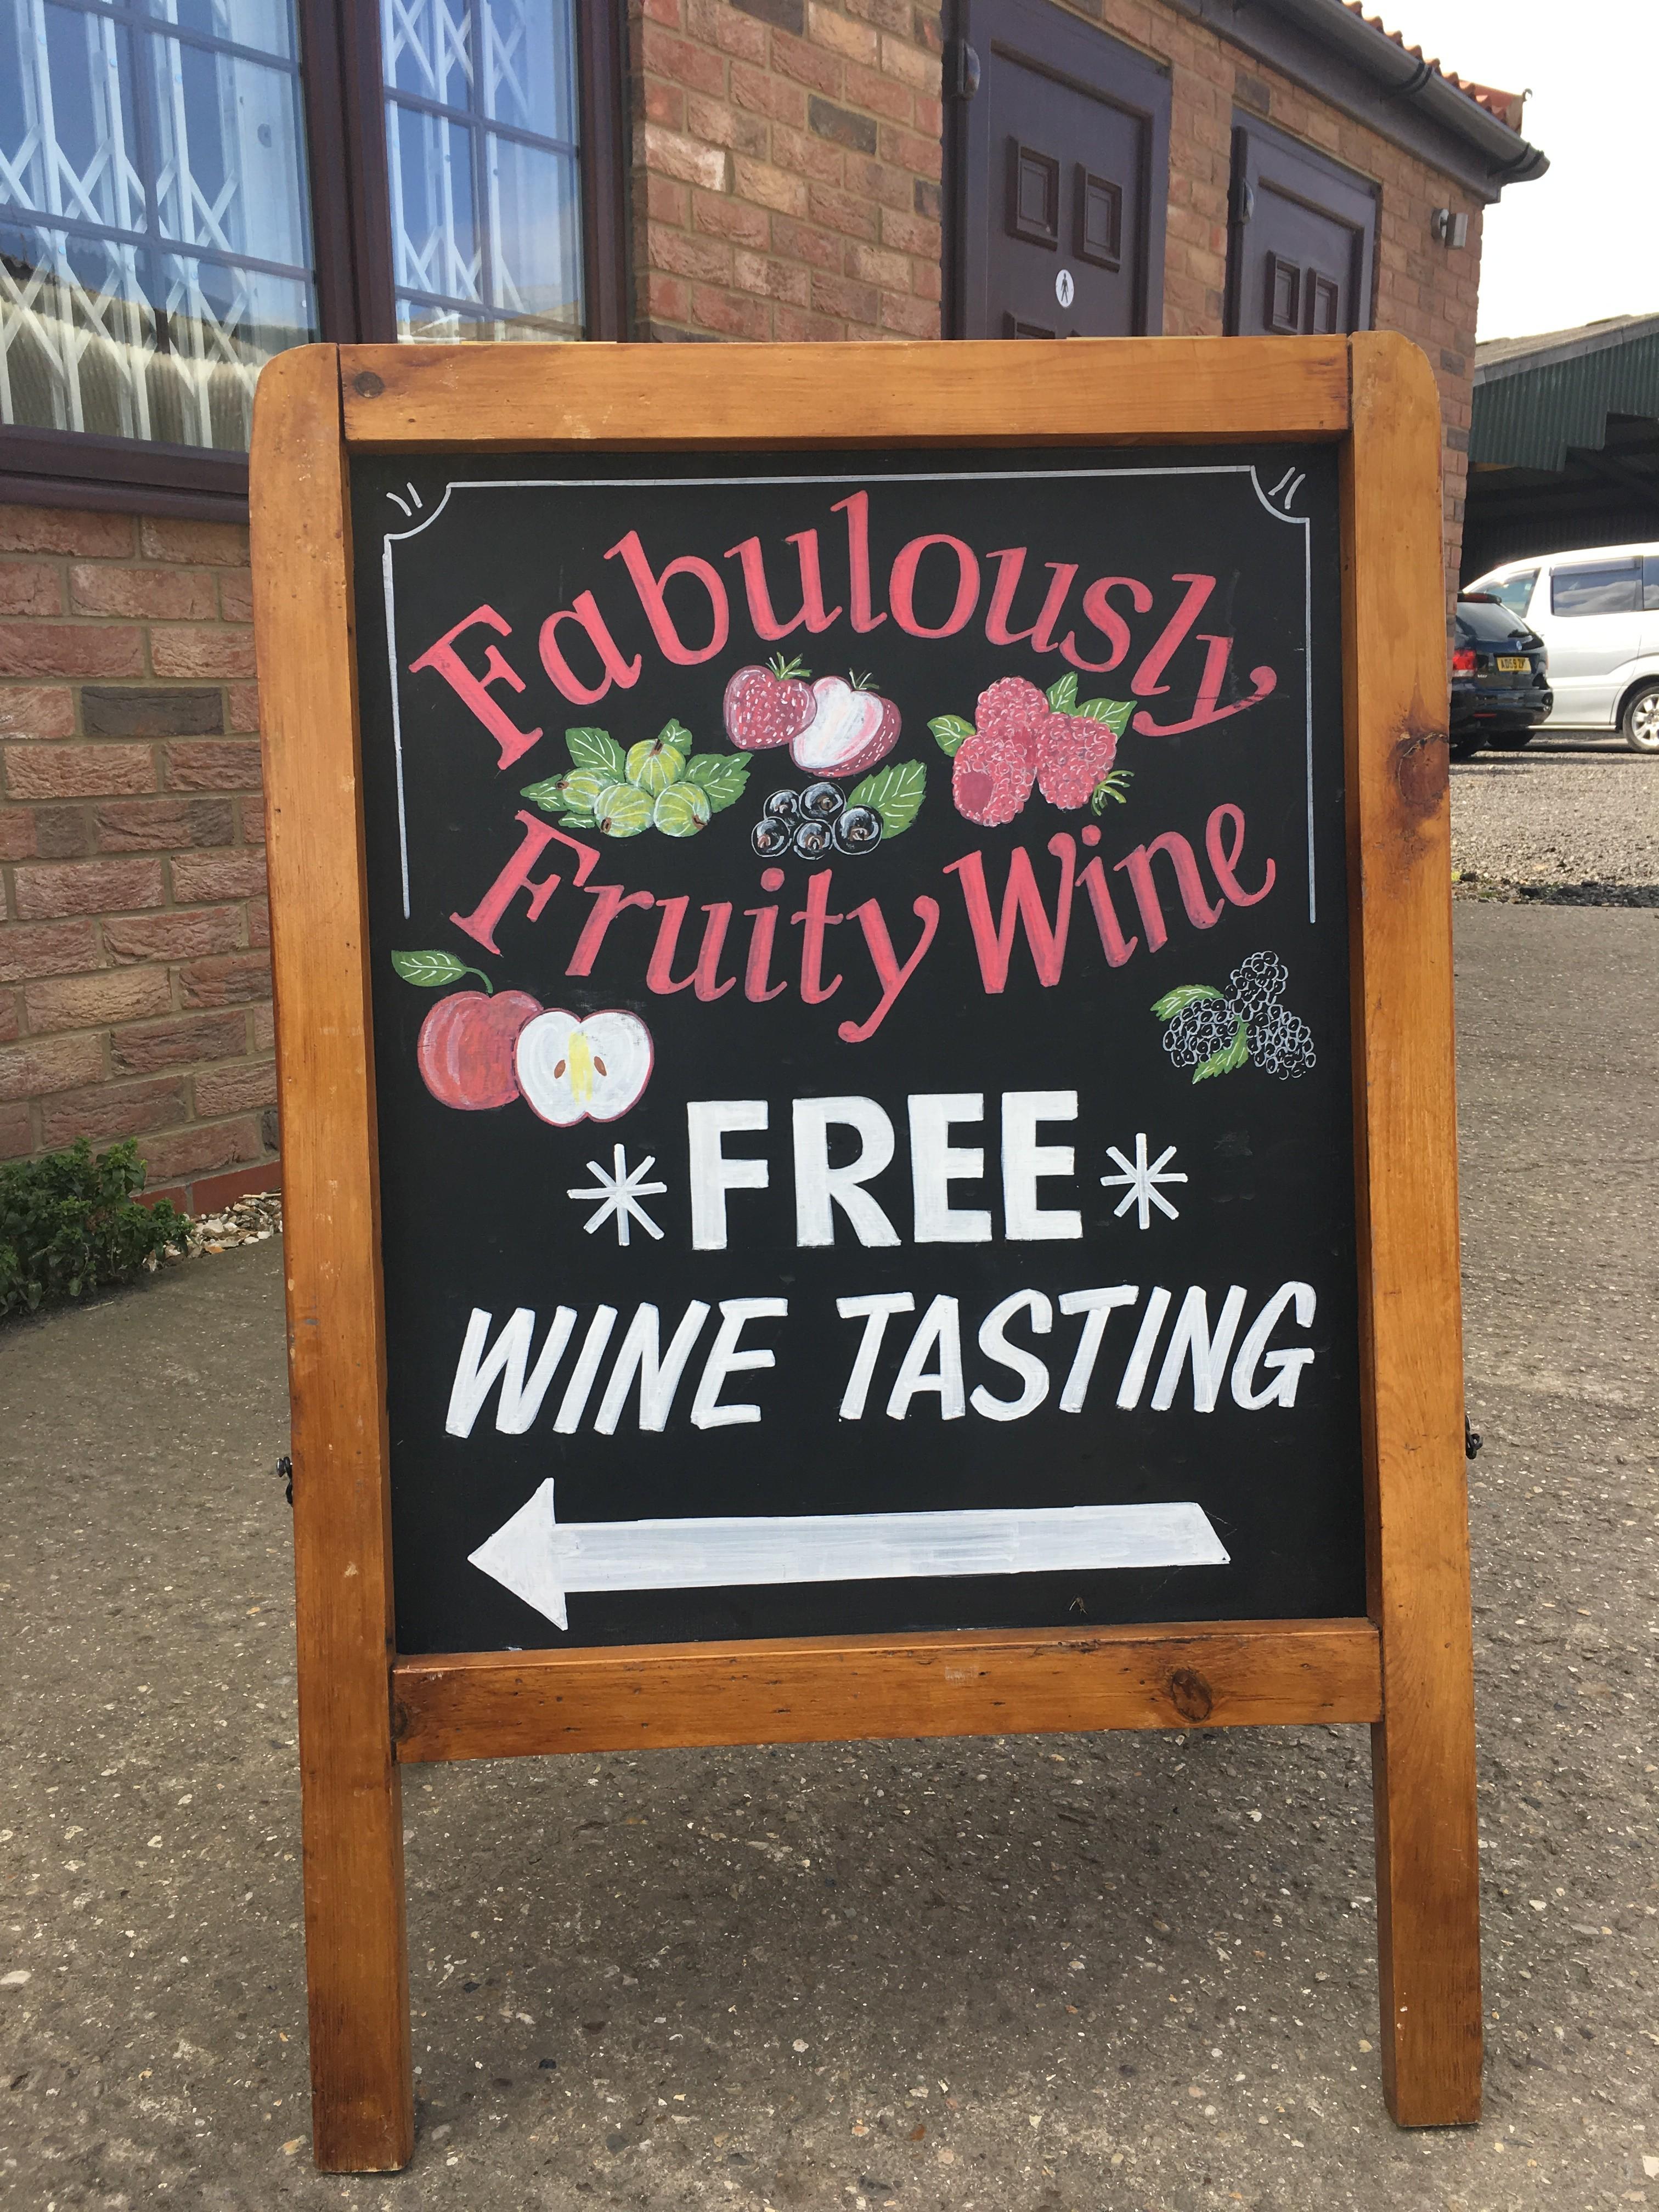 Free wine tasting every Saturday